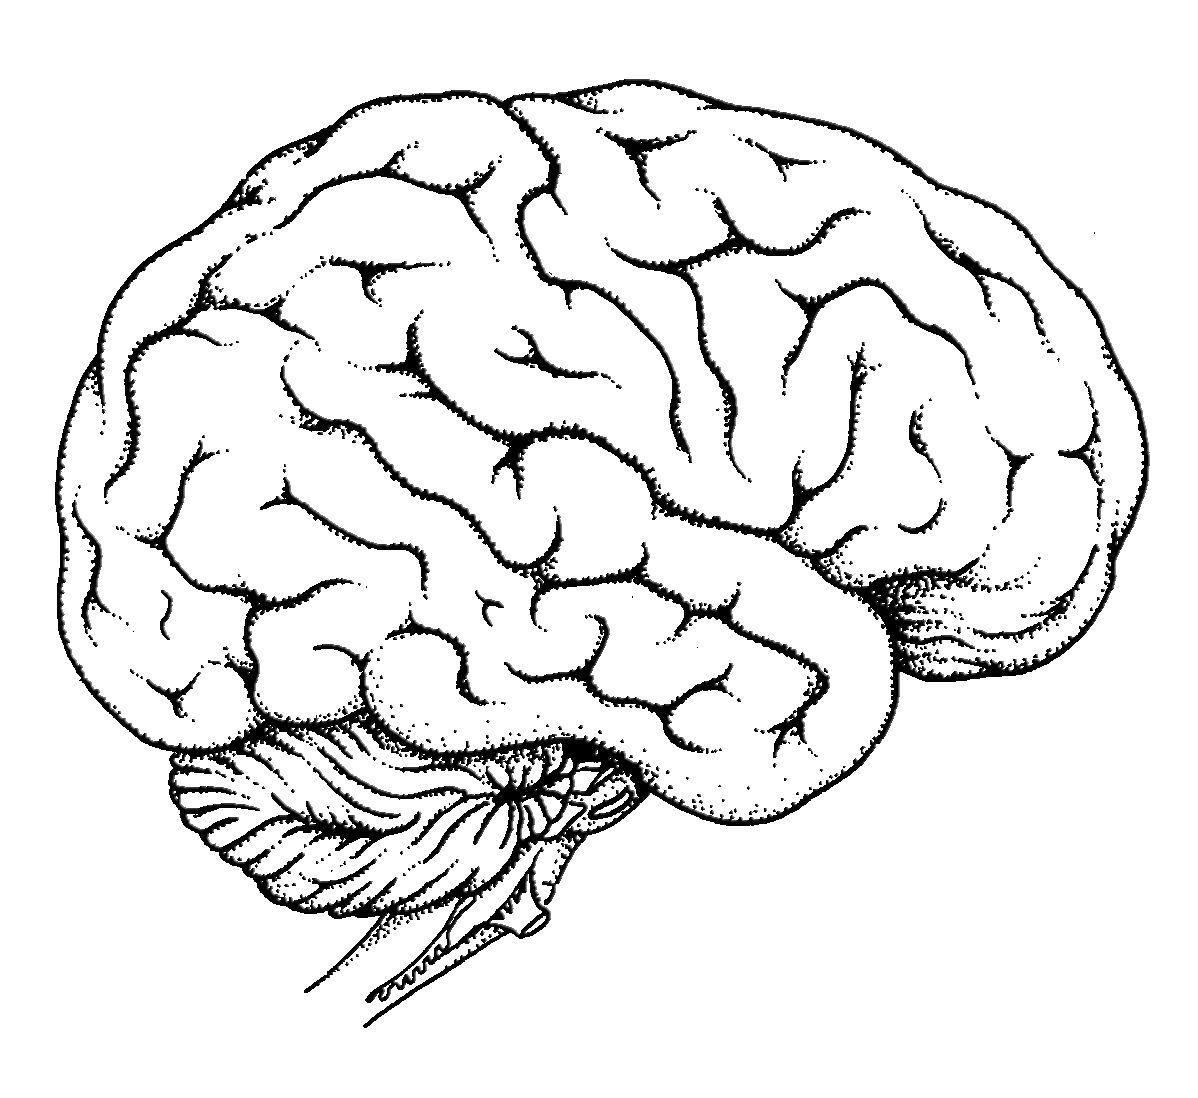 Diagram Of Human Brain - Anatomy | Alicia\'s Brain | Pinterest ...